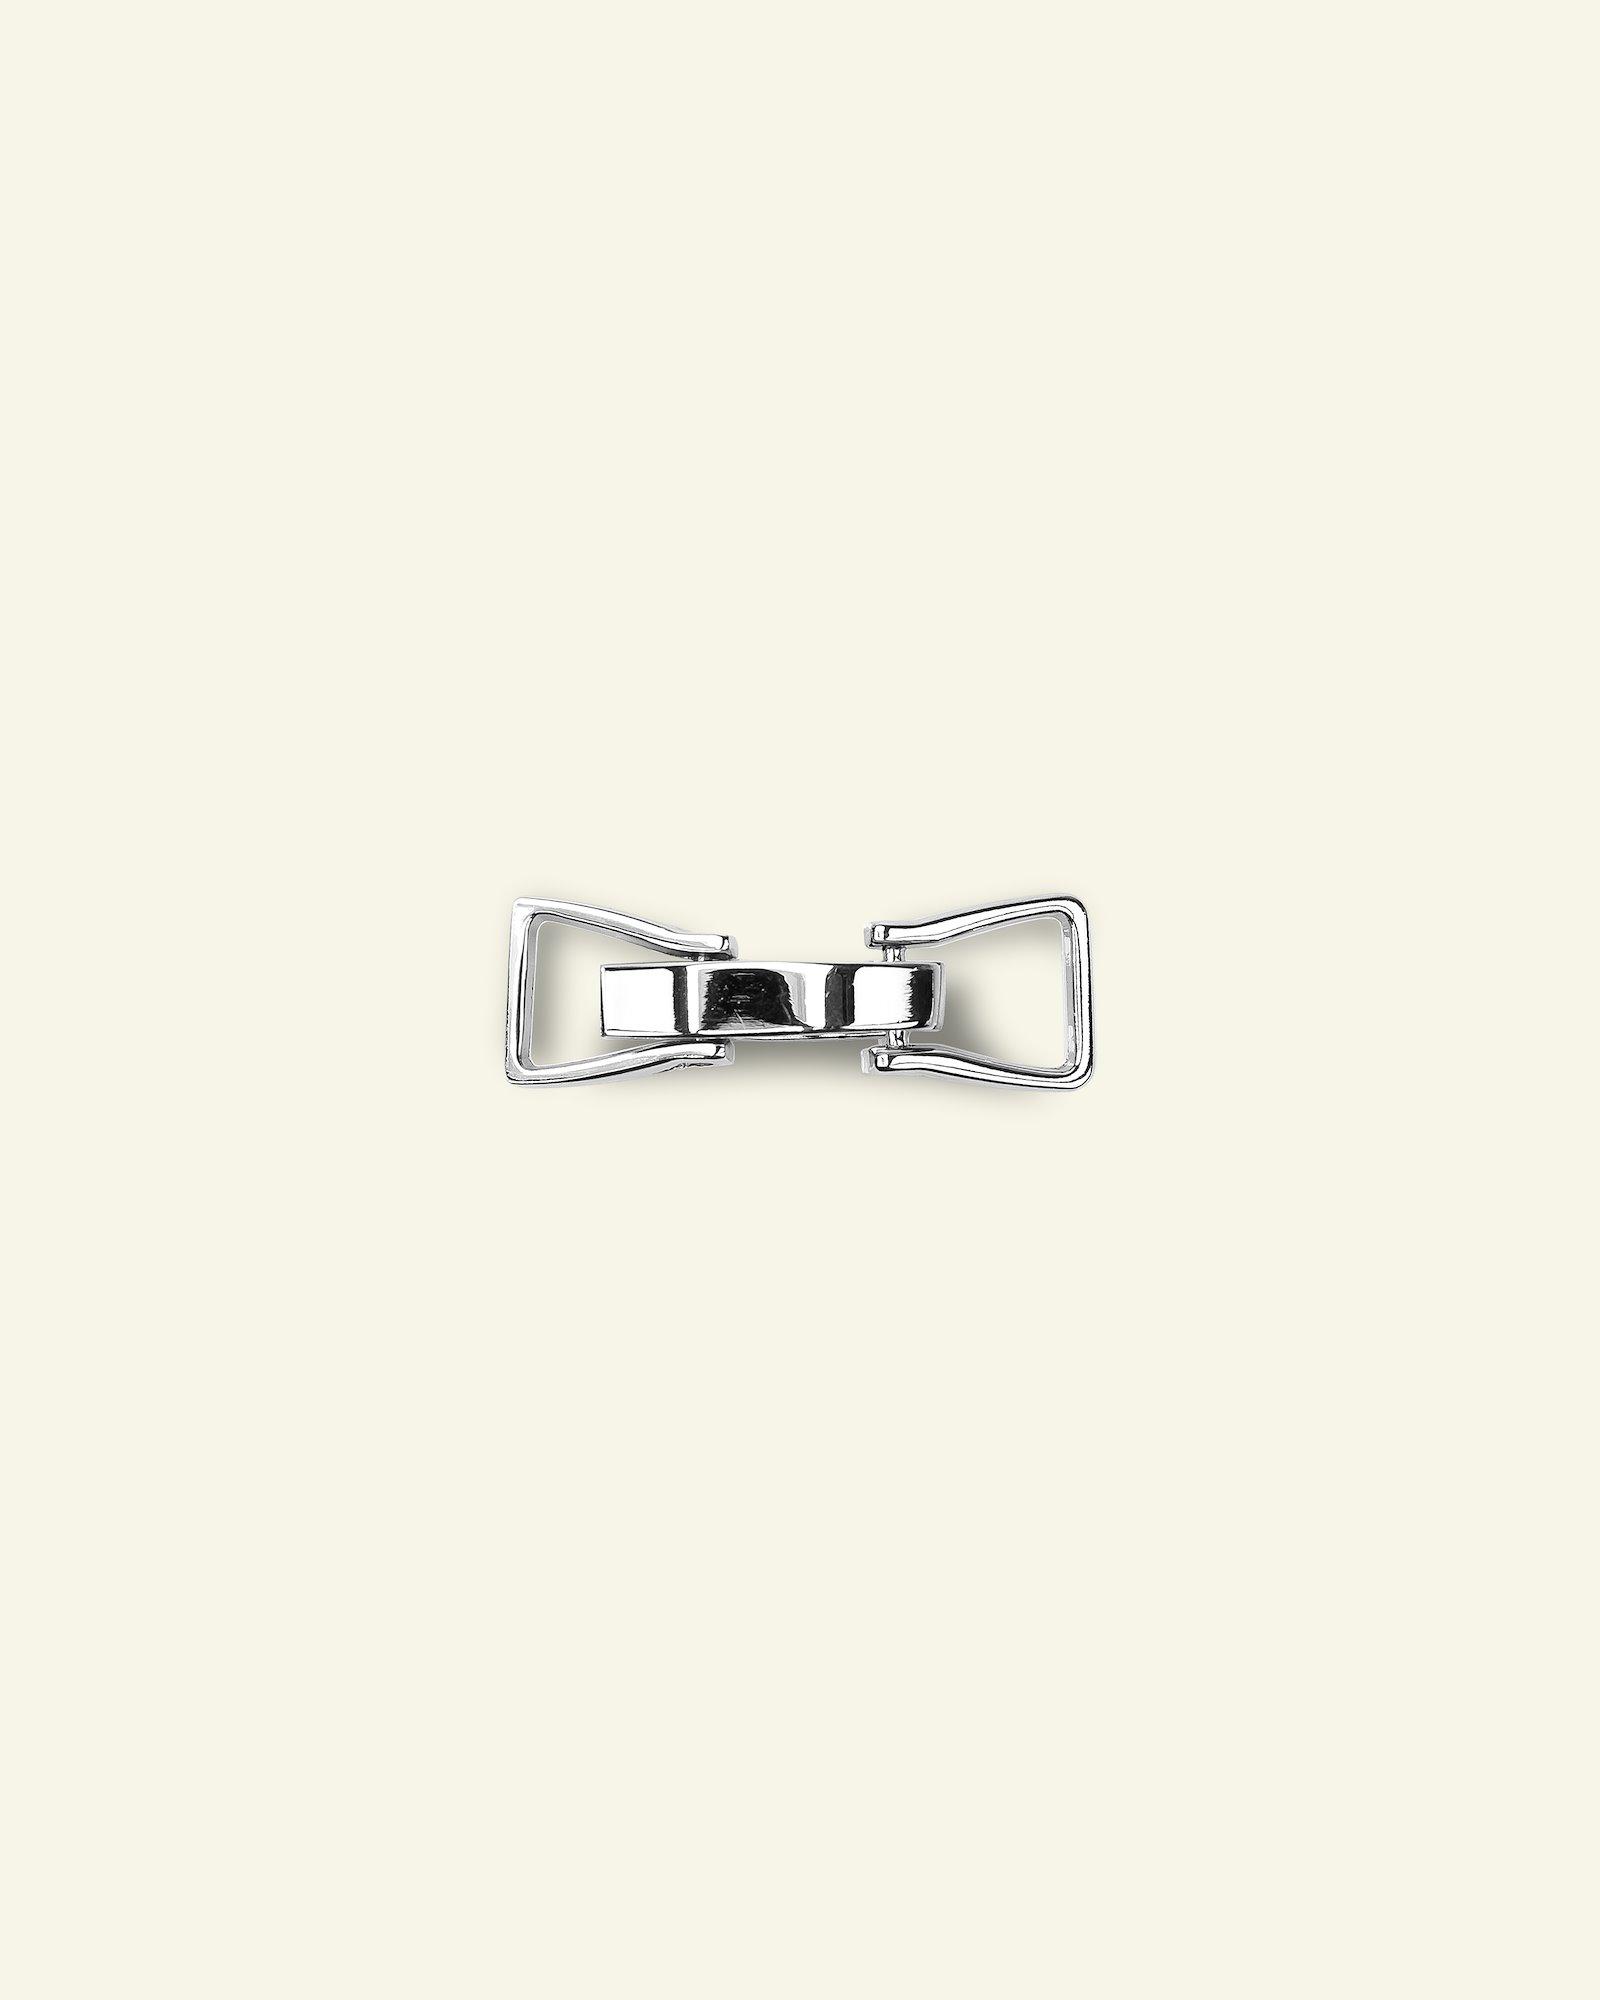 Toggle fastener metal 19x55mm silver 1pc